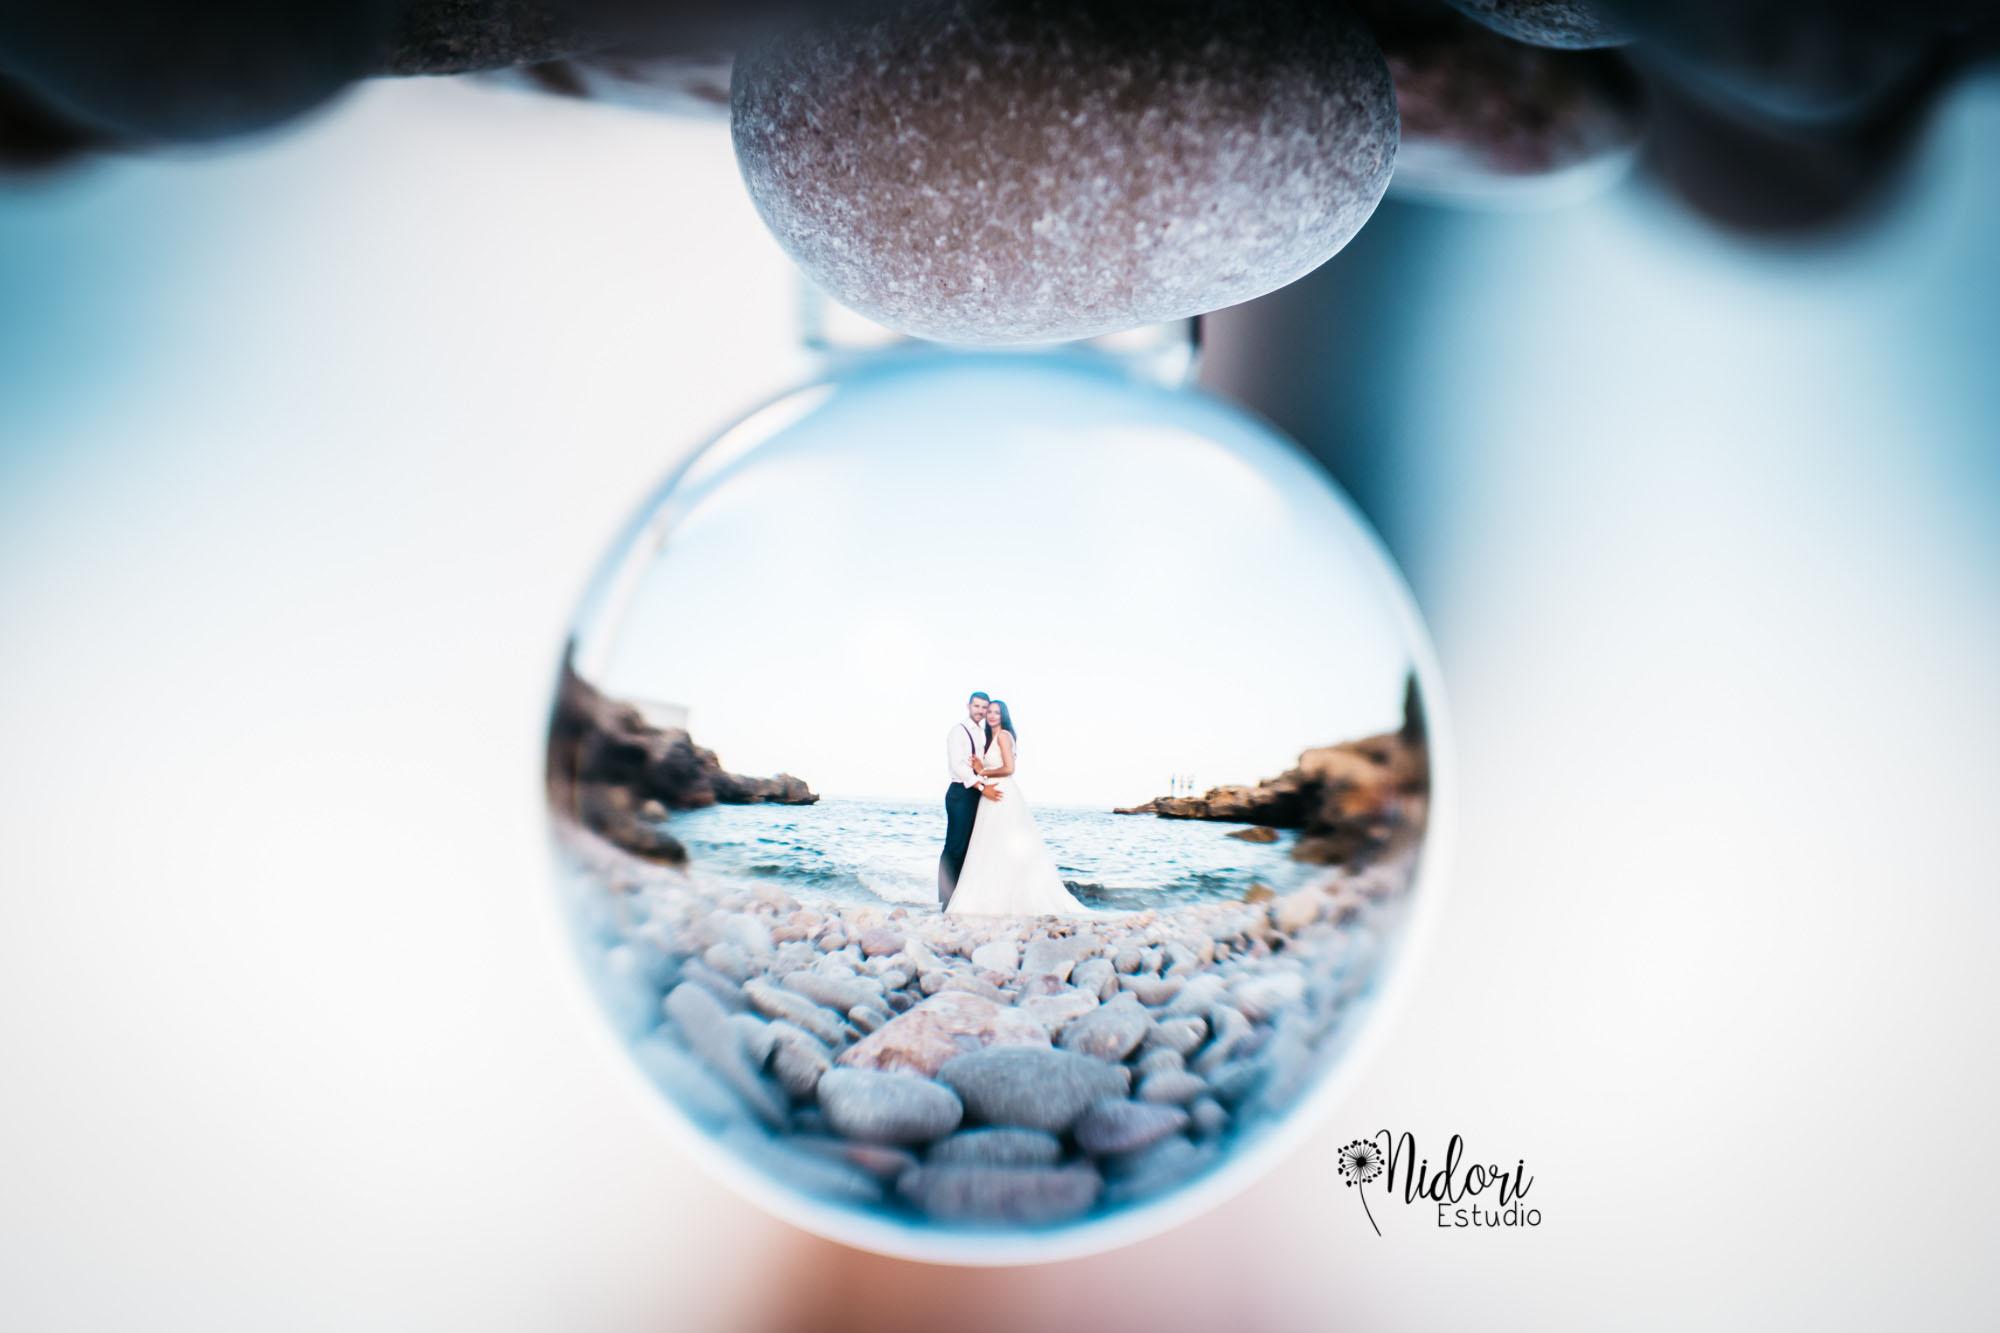 fotos-de-boda-reportaje-novios-fotografia-boda-nidoriestudio-fotos-valencia-almazora-castellon-españa-spain-066